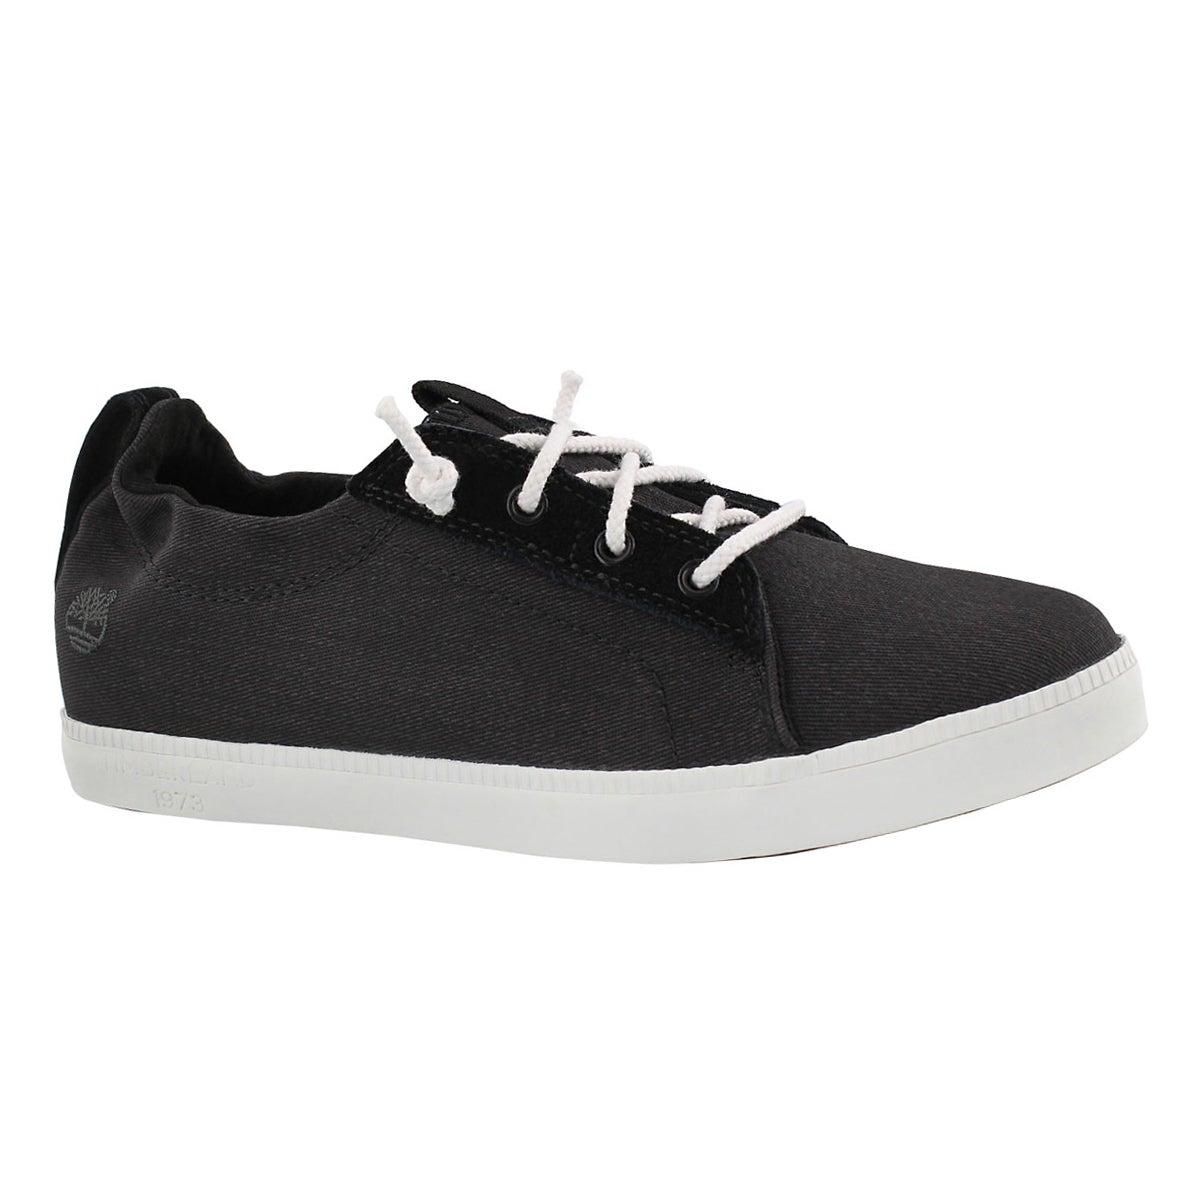 Women's NEWPORT BAY black lace up sneakers